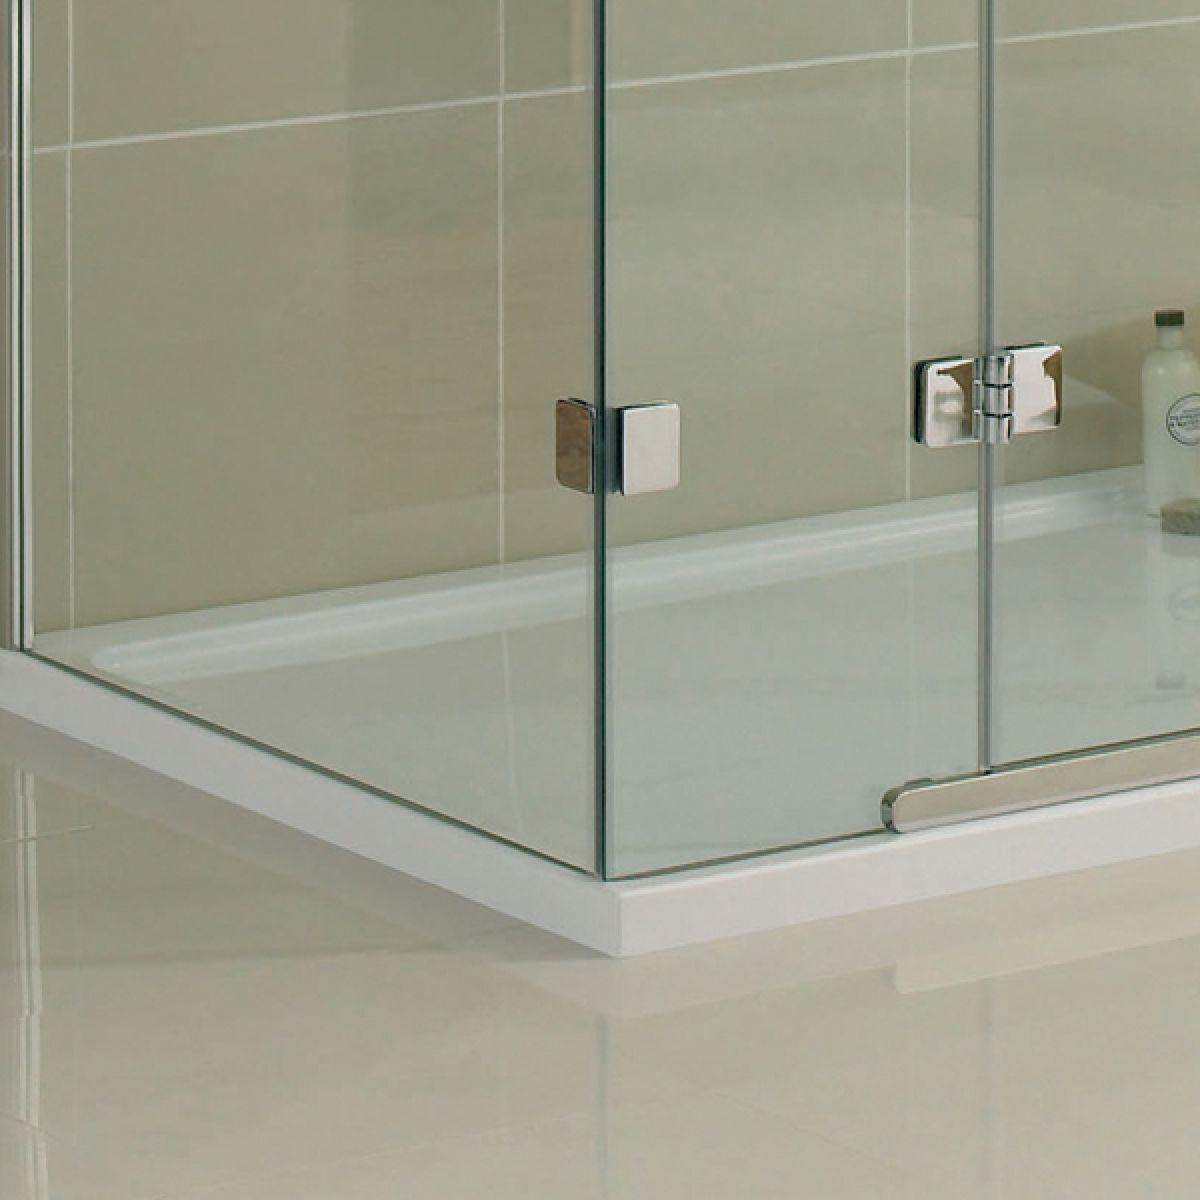 Aquadart Inline 3 Sided Hinged Door Shower Enclosure Detail 3